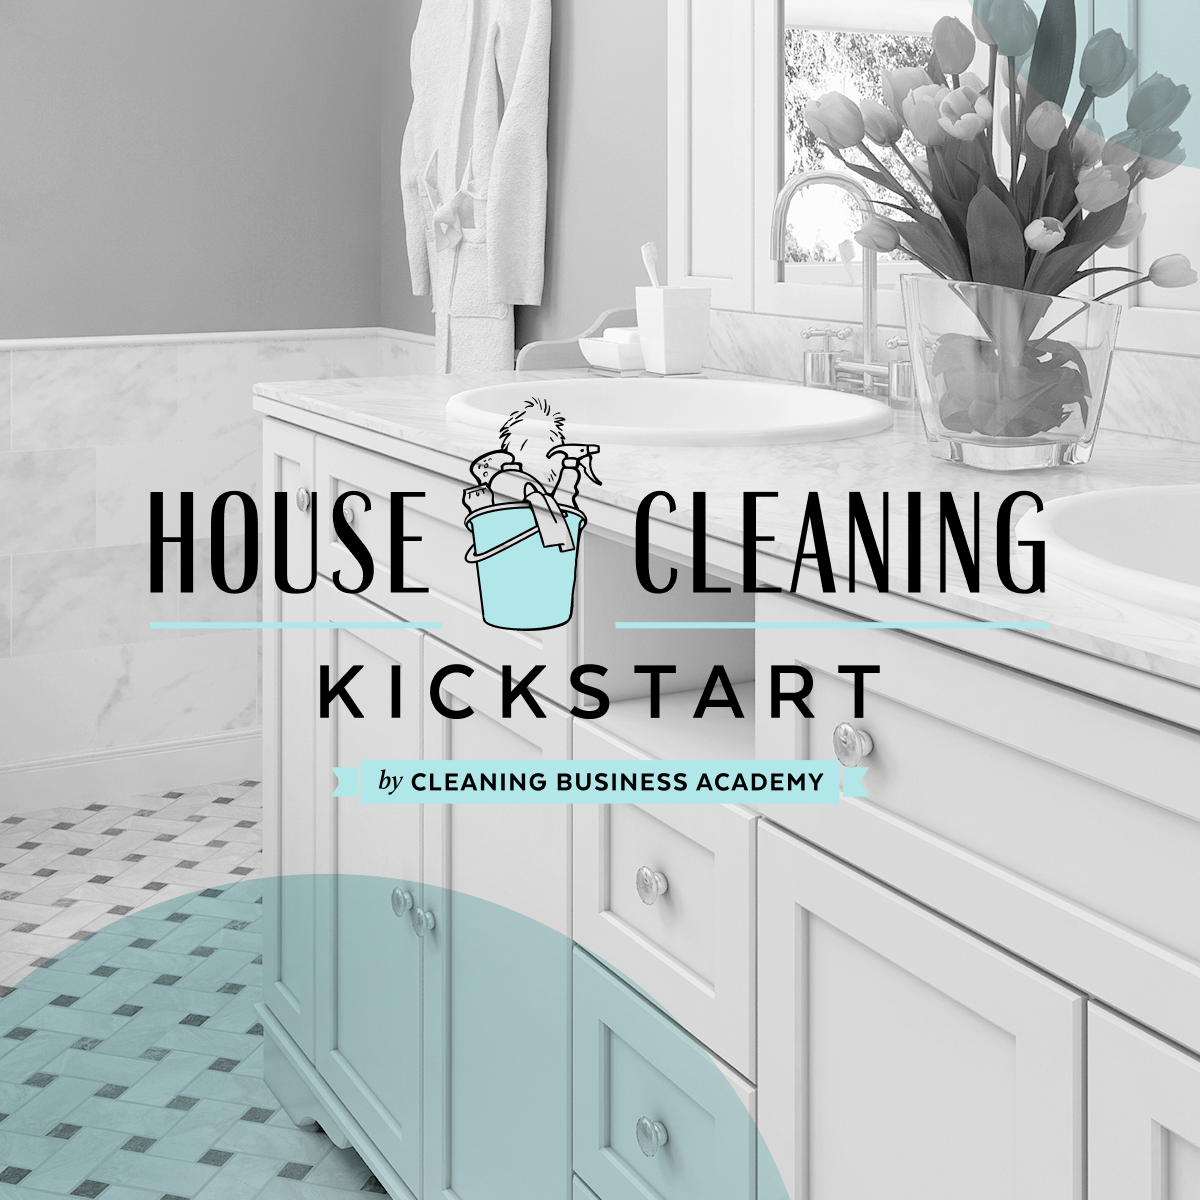 House Cleaning Kickstart Course